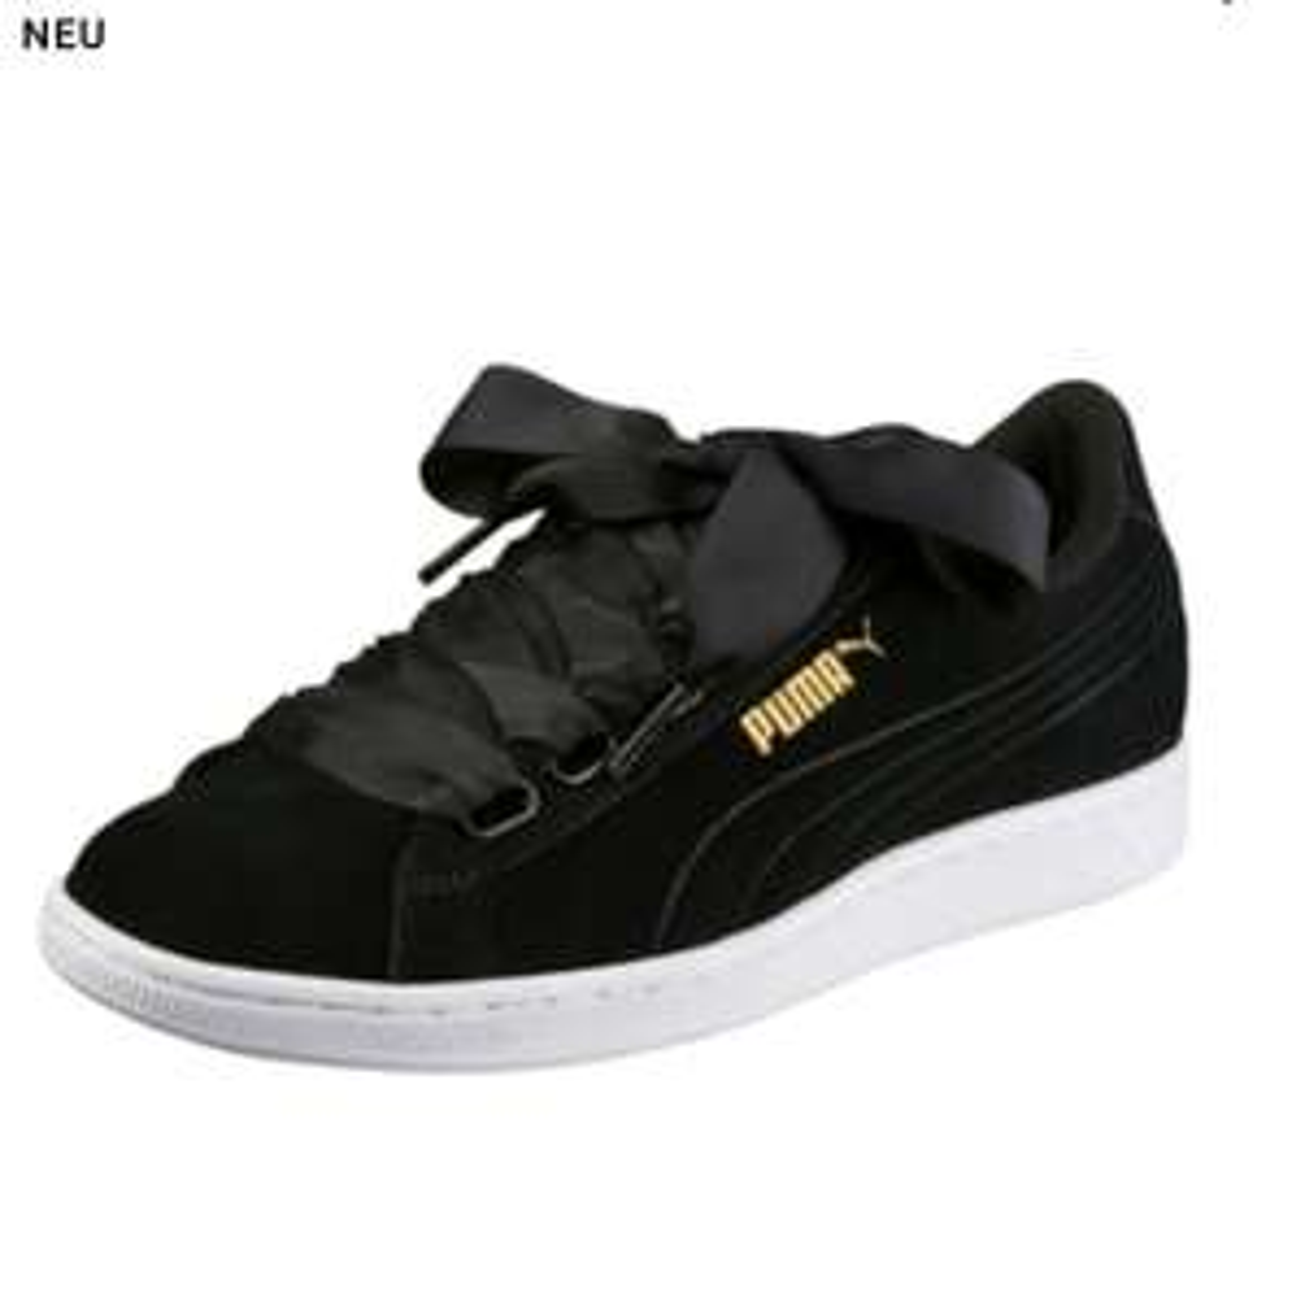 puma-vikky-ribbon-womens-trainers-sneaker-low-